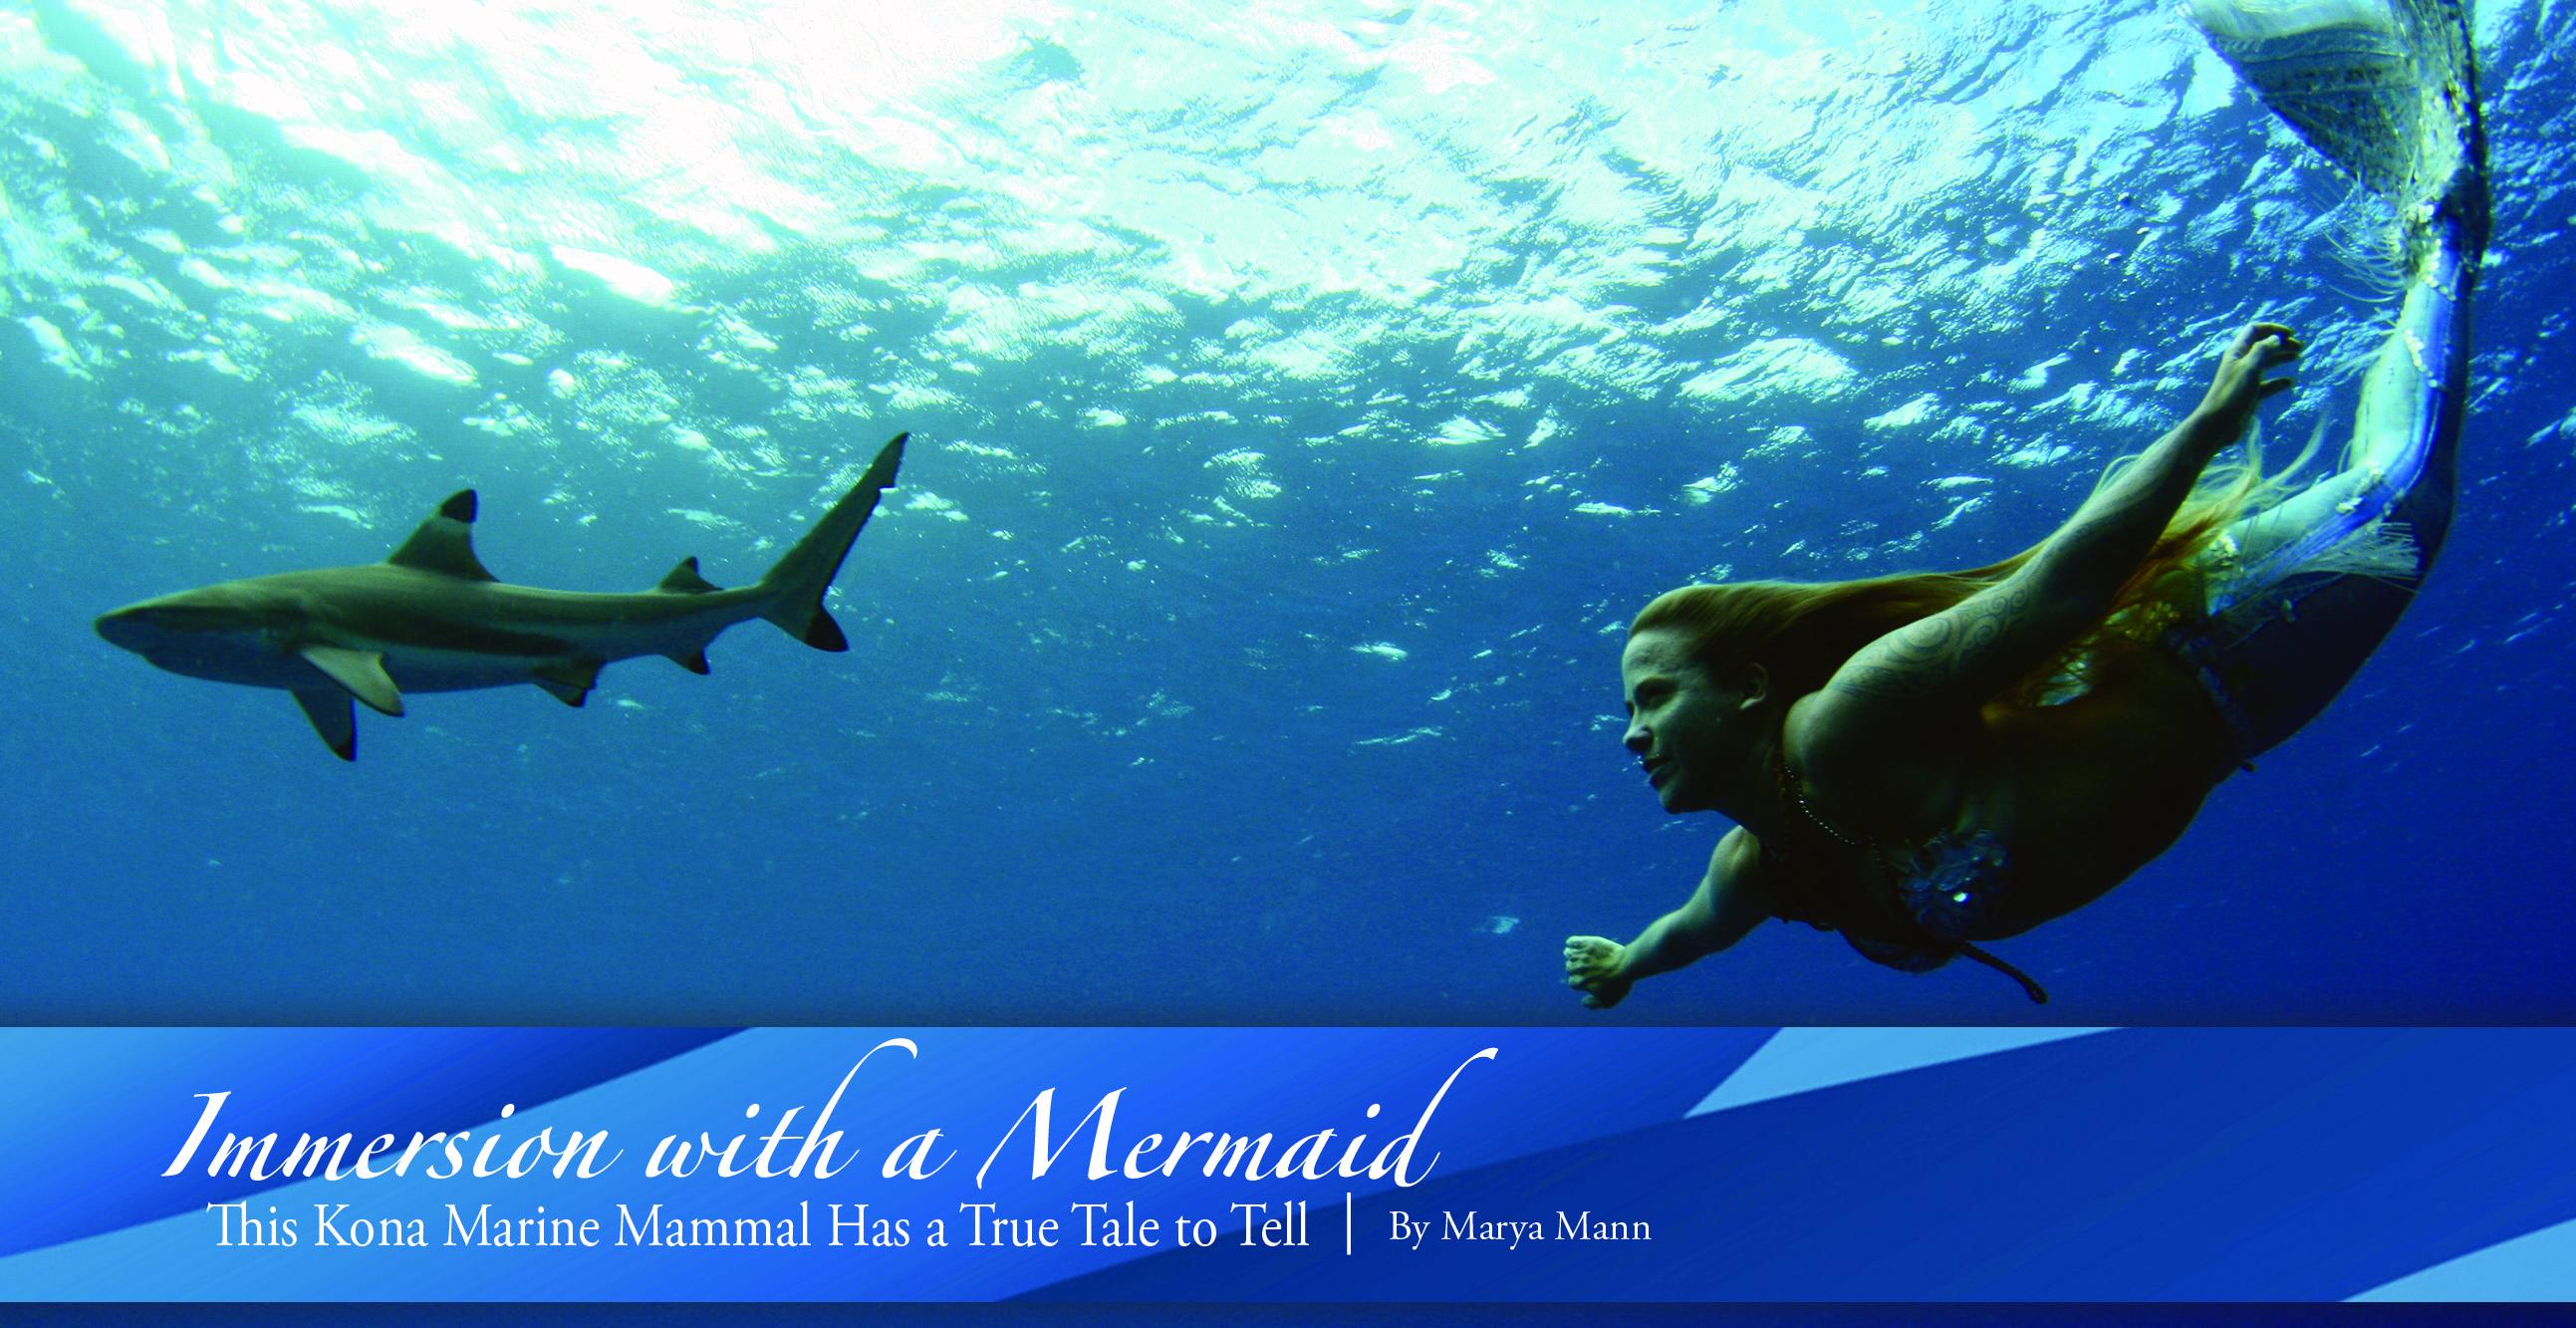 immersion with a mermaid ke ola magazine